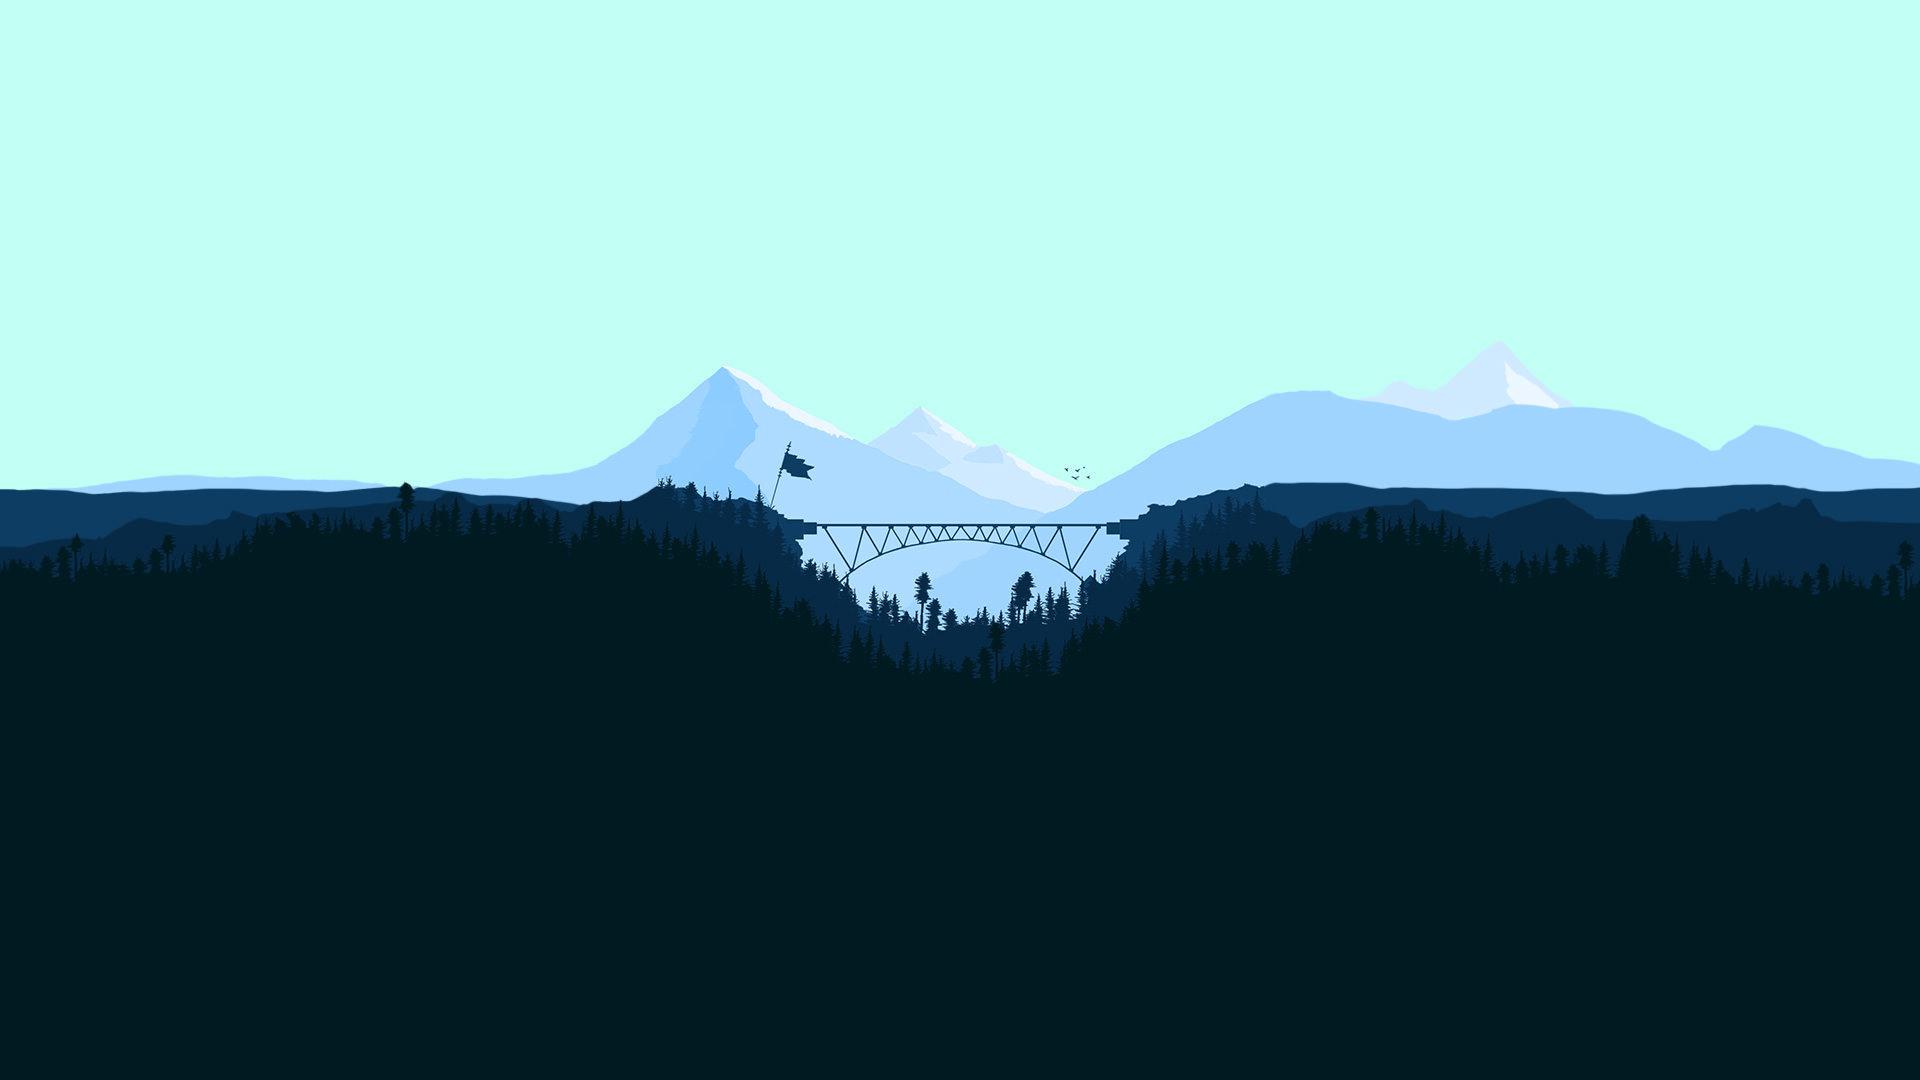 Minimalist Bridge Between Mountains Wallpaper, HD ...